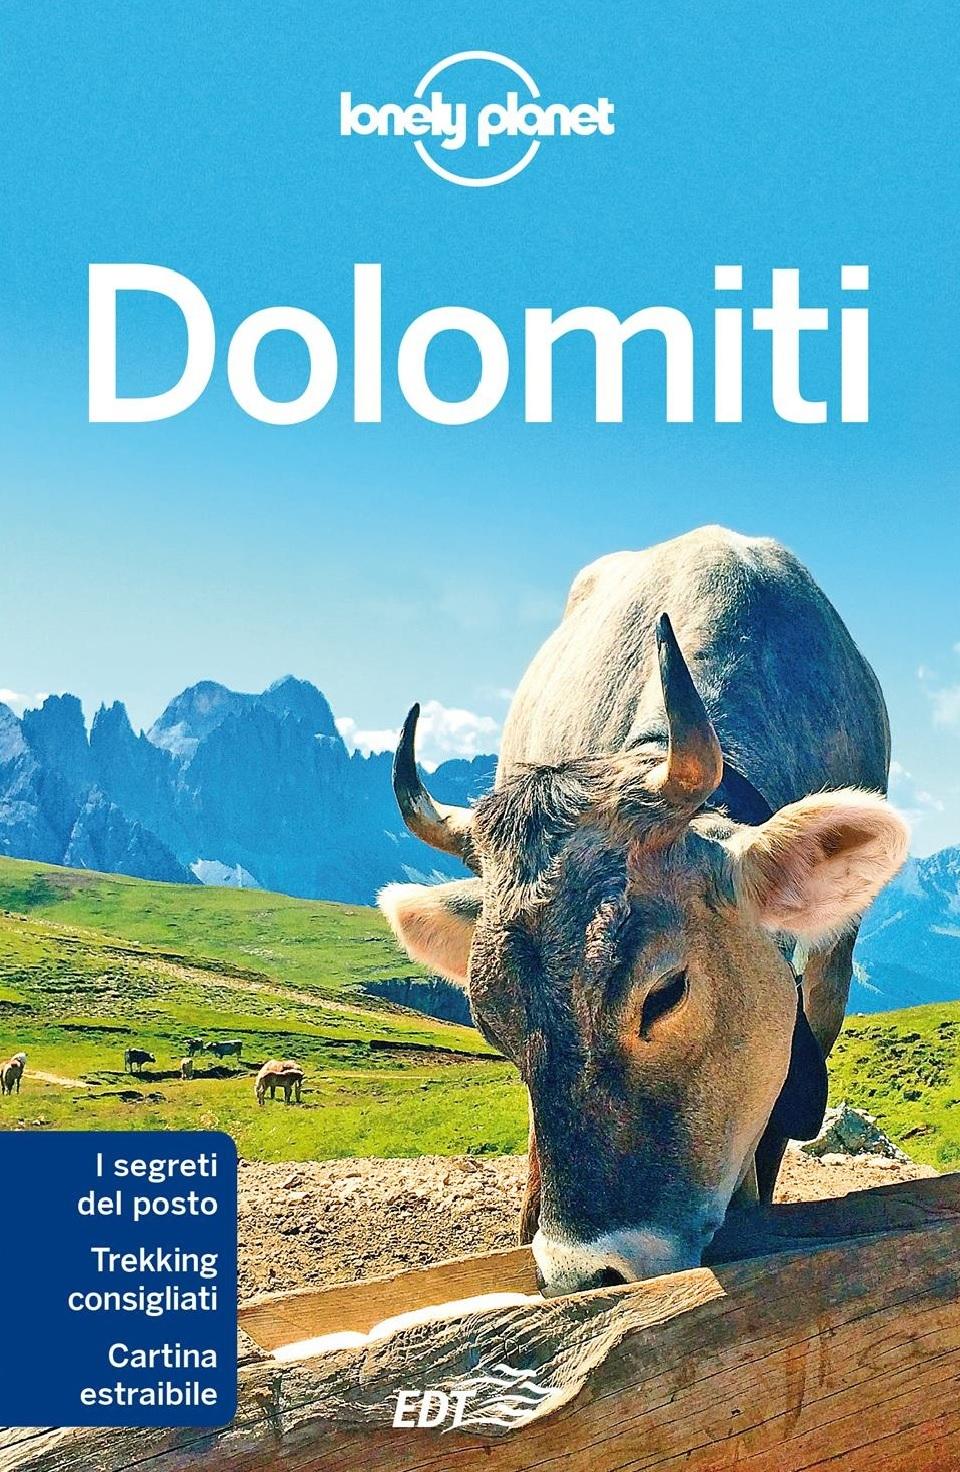 LONELY-PLANET-DOLOMITI